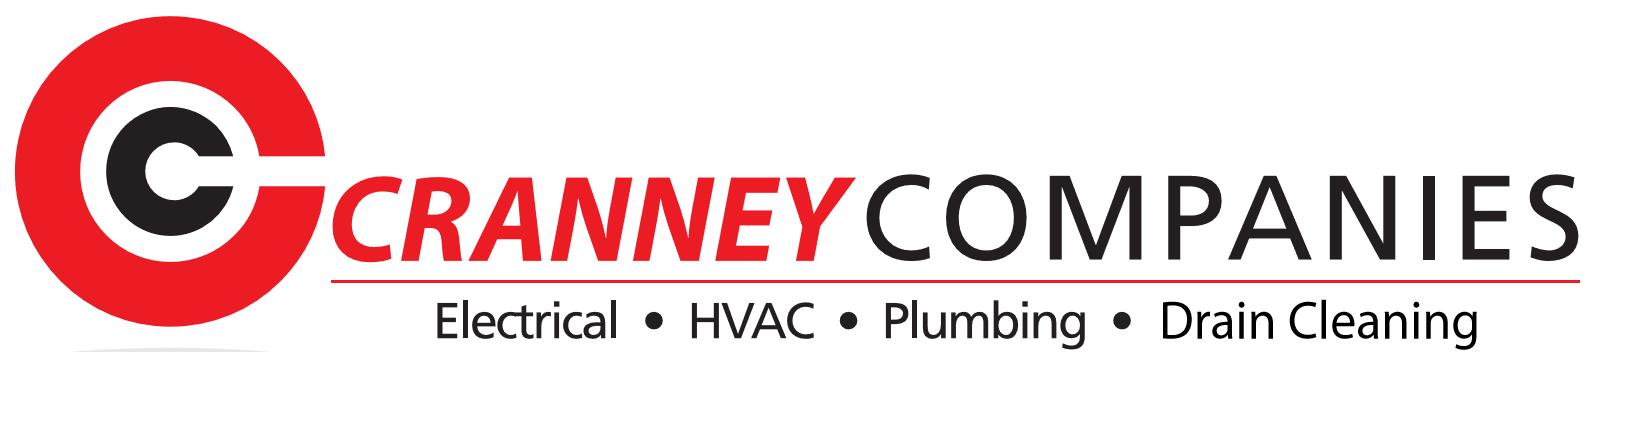 Cranney Companies